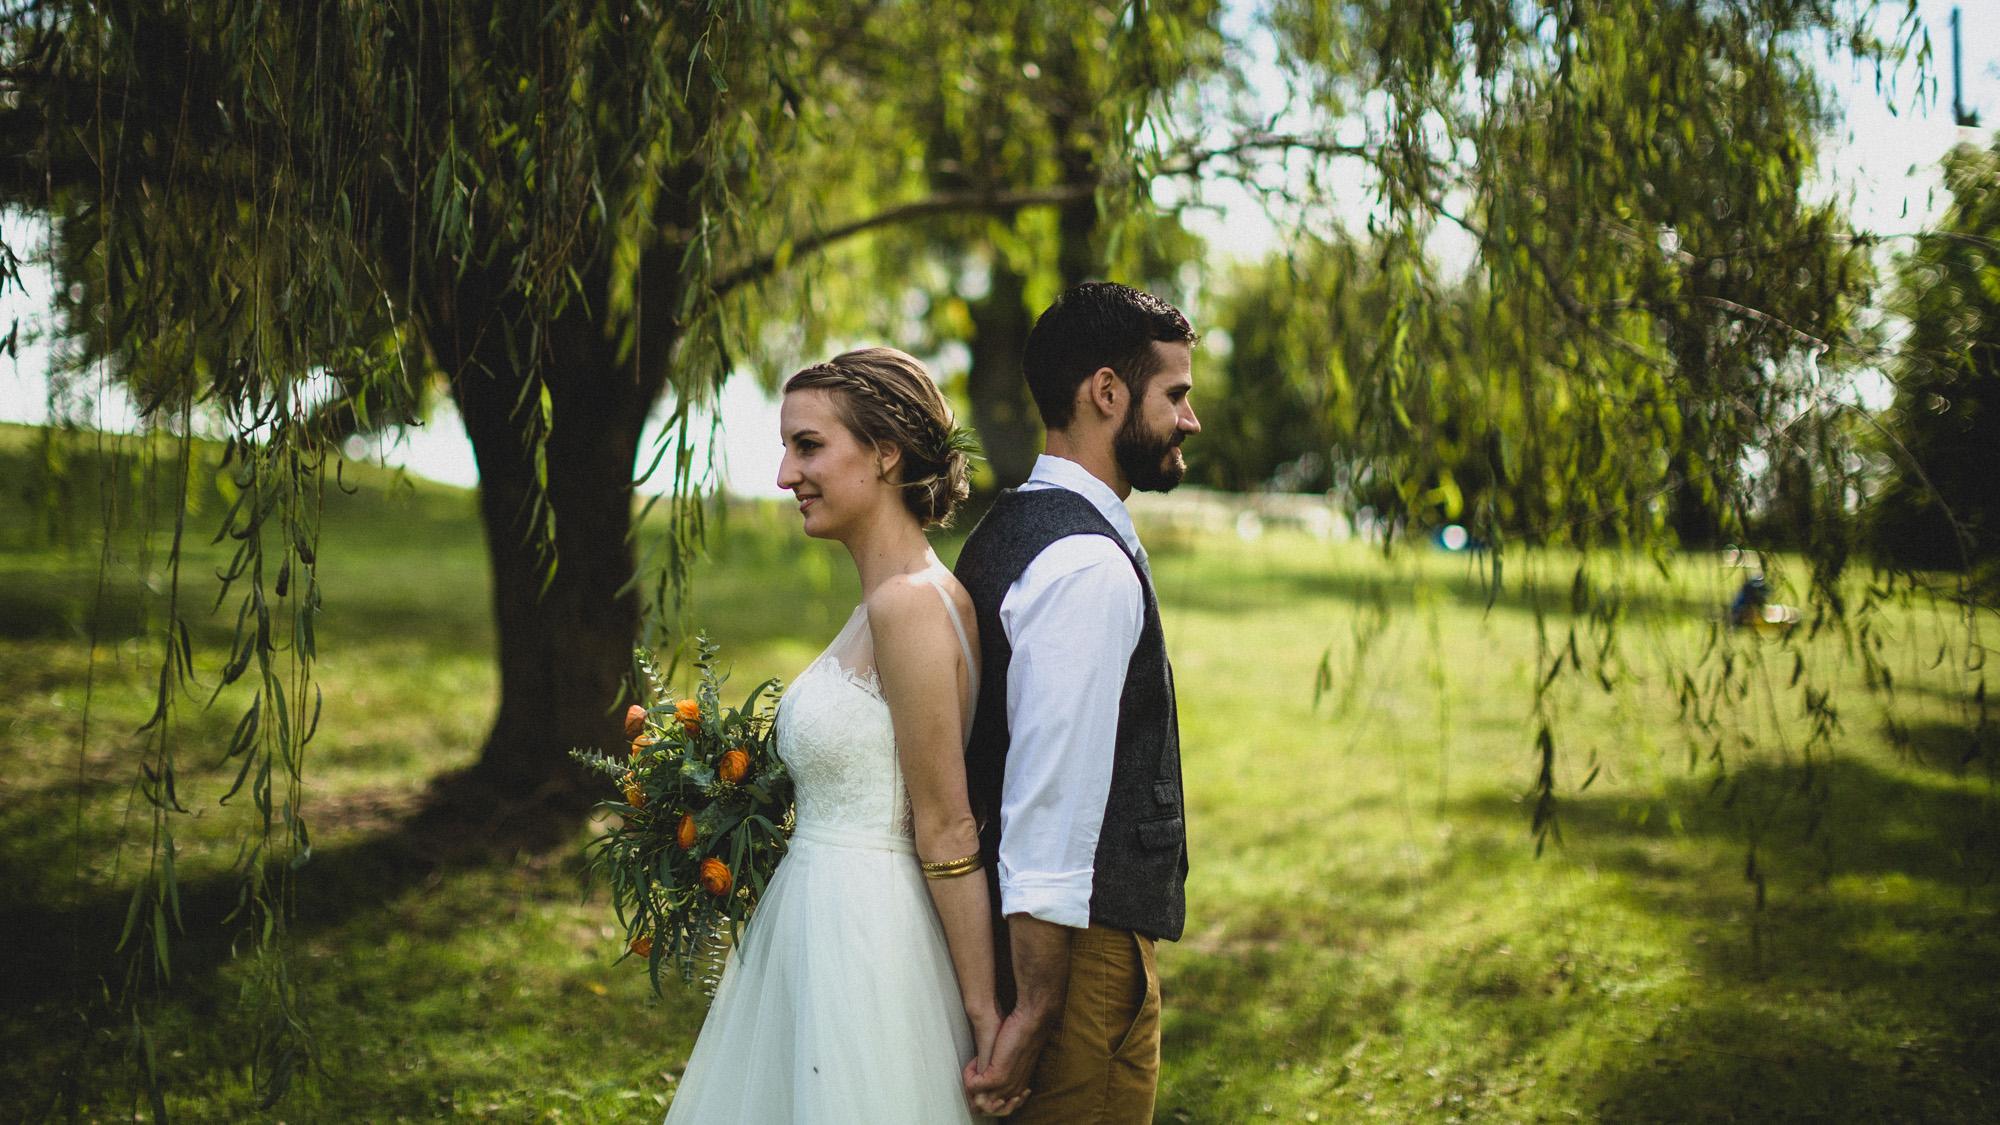 alec_vanderboom_springfield_missouri_wedding-0042.jpg